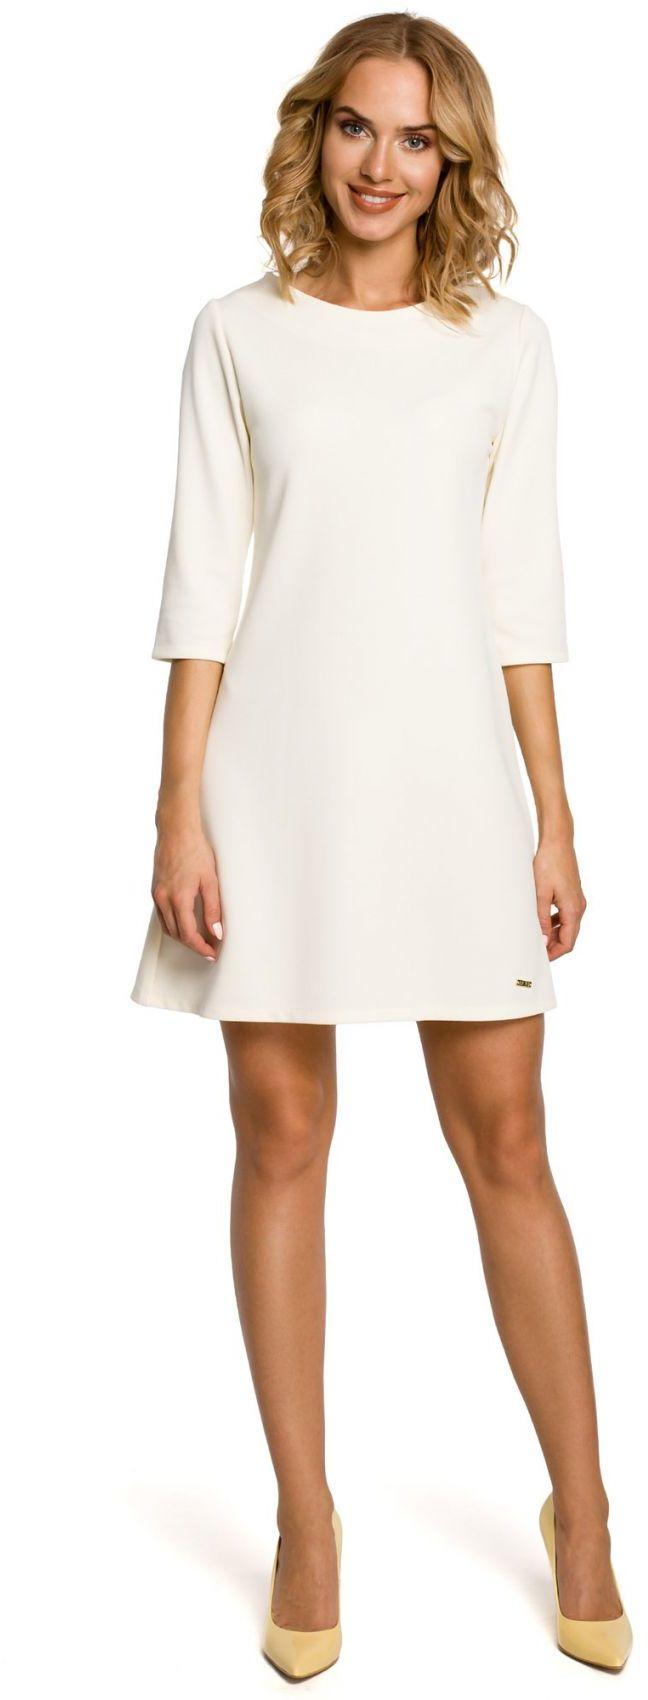 M029 Gładka tunika sukienka trapezowa - ecru